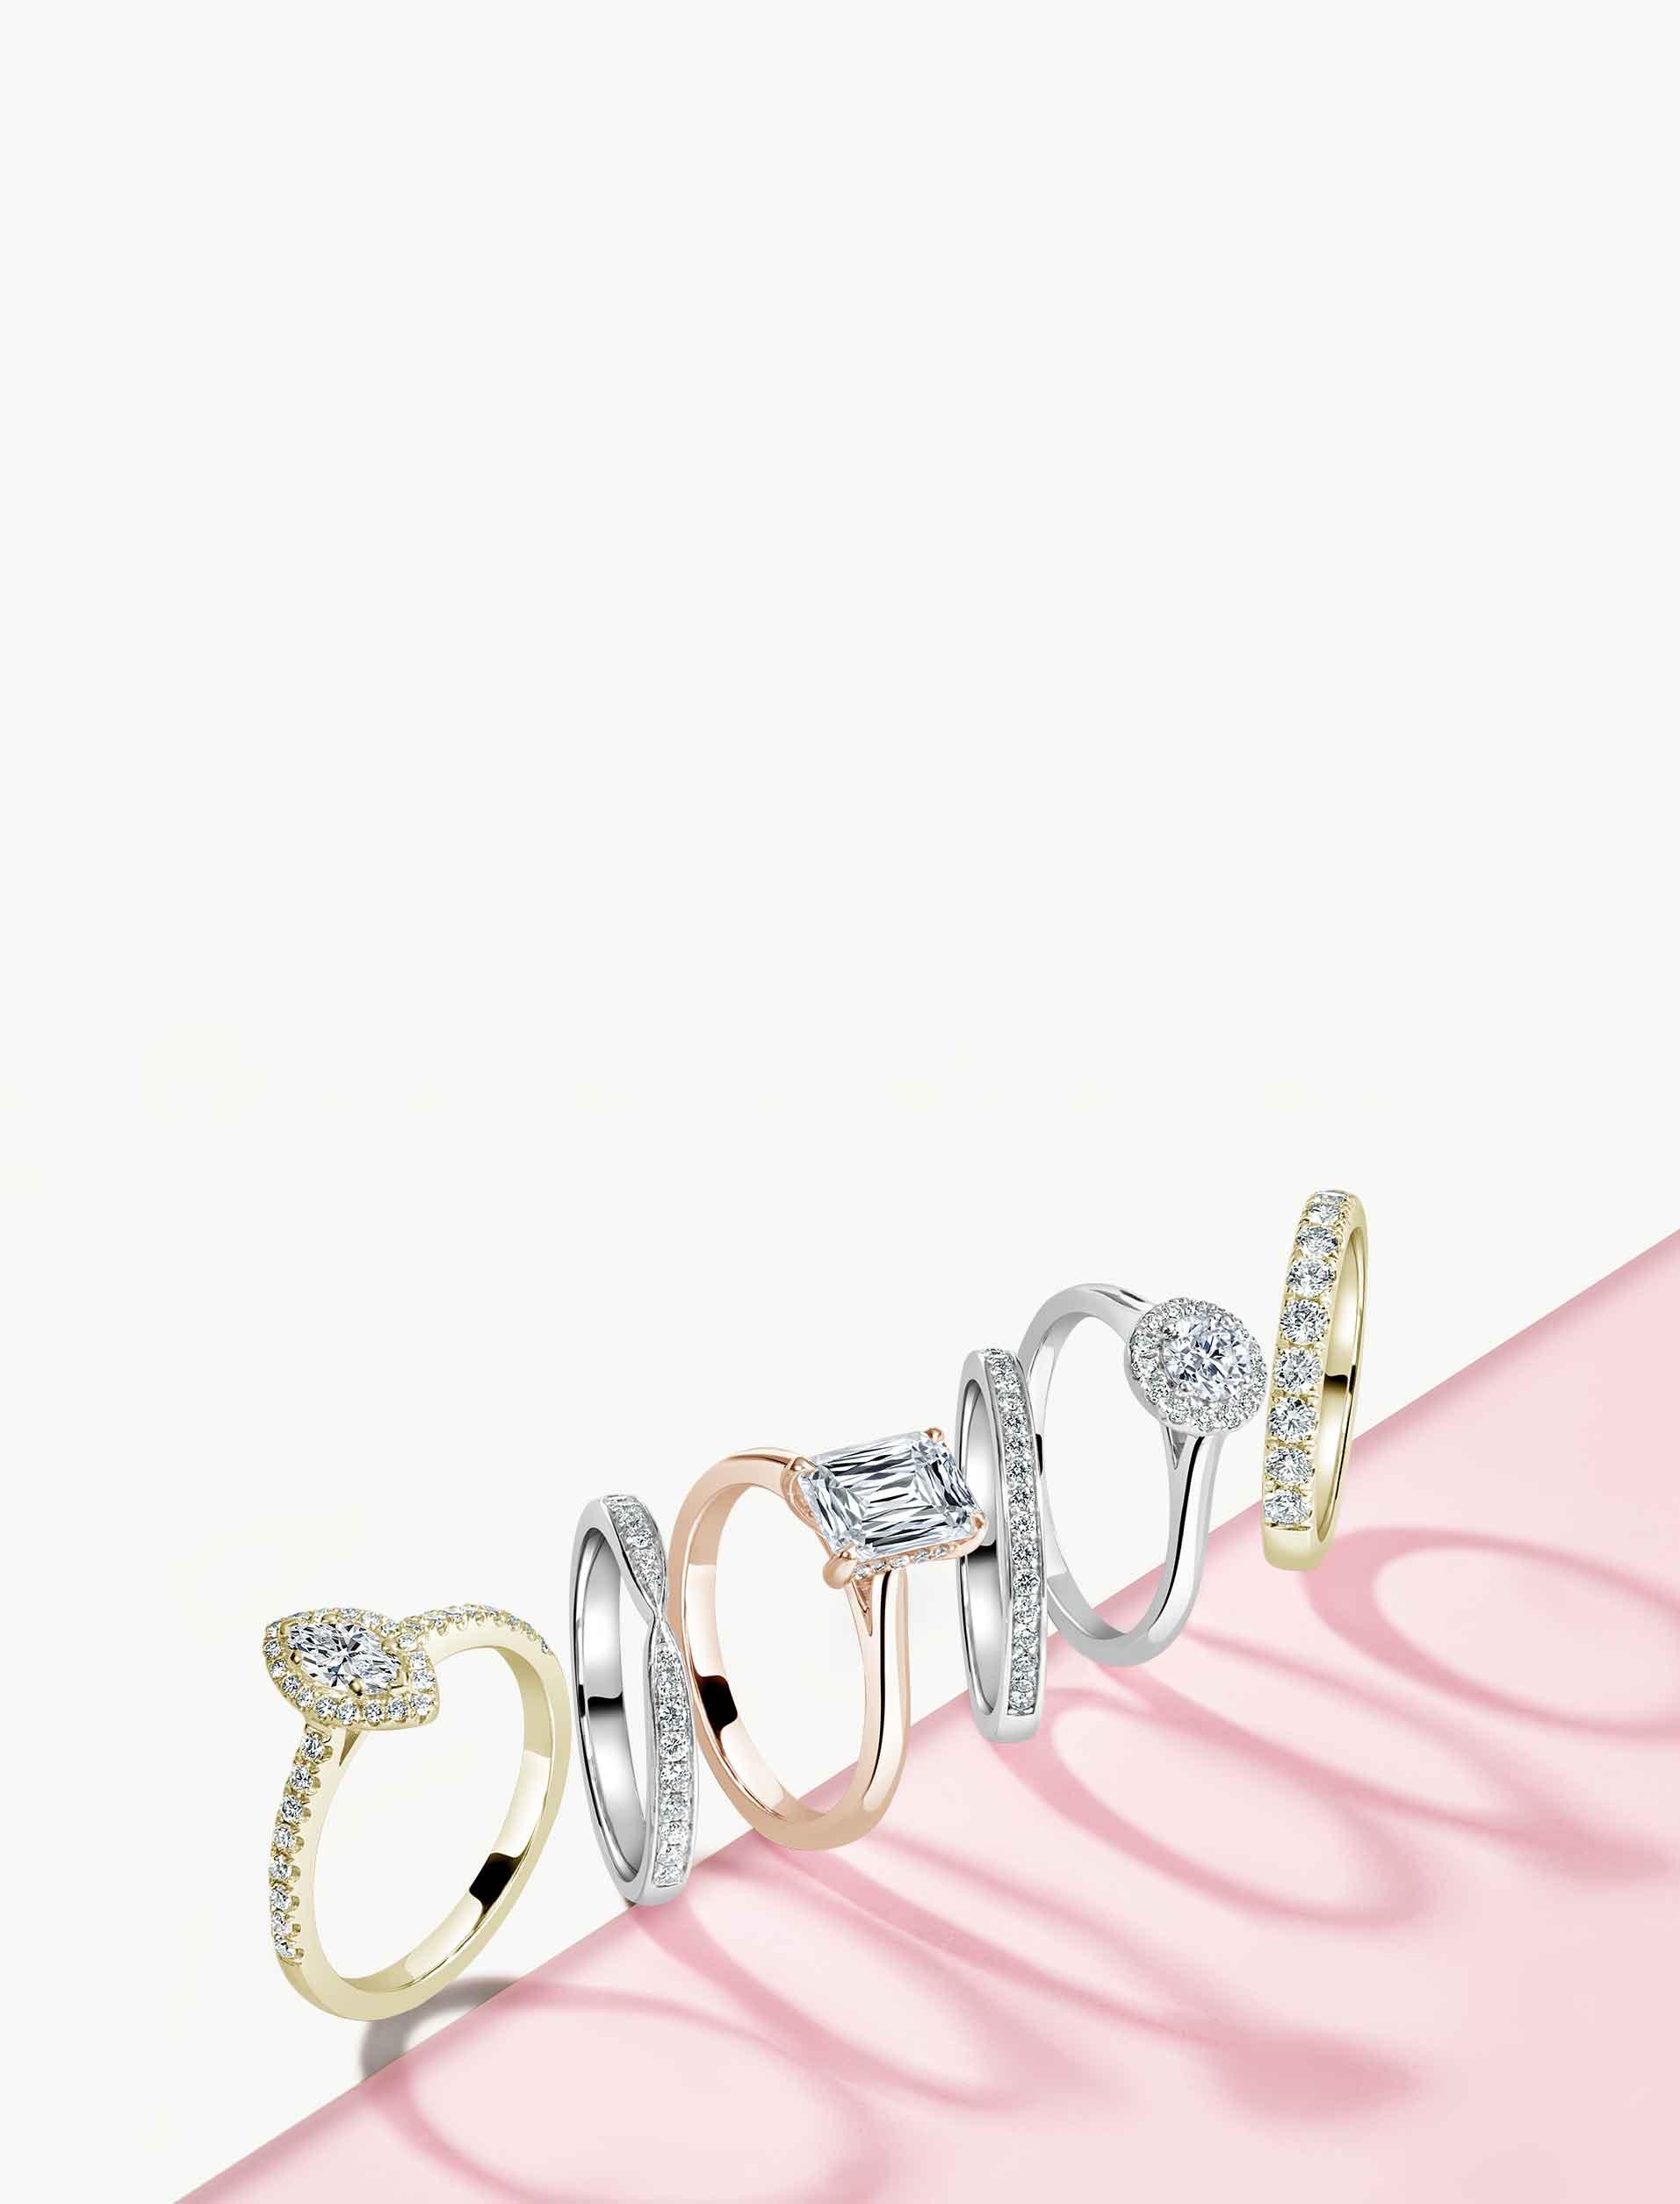 Rose Gold  Radiant Cut Engagement Rings - Steven Stone